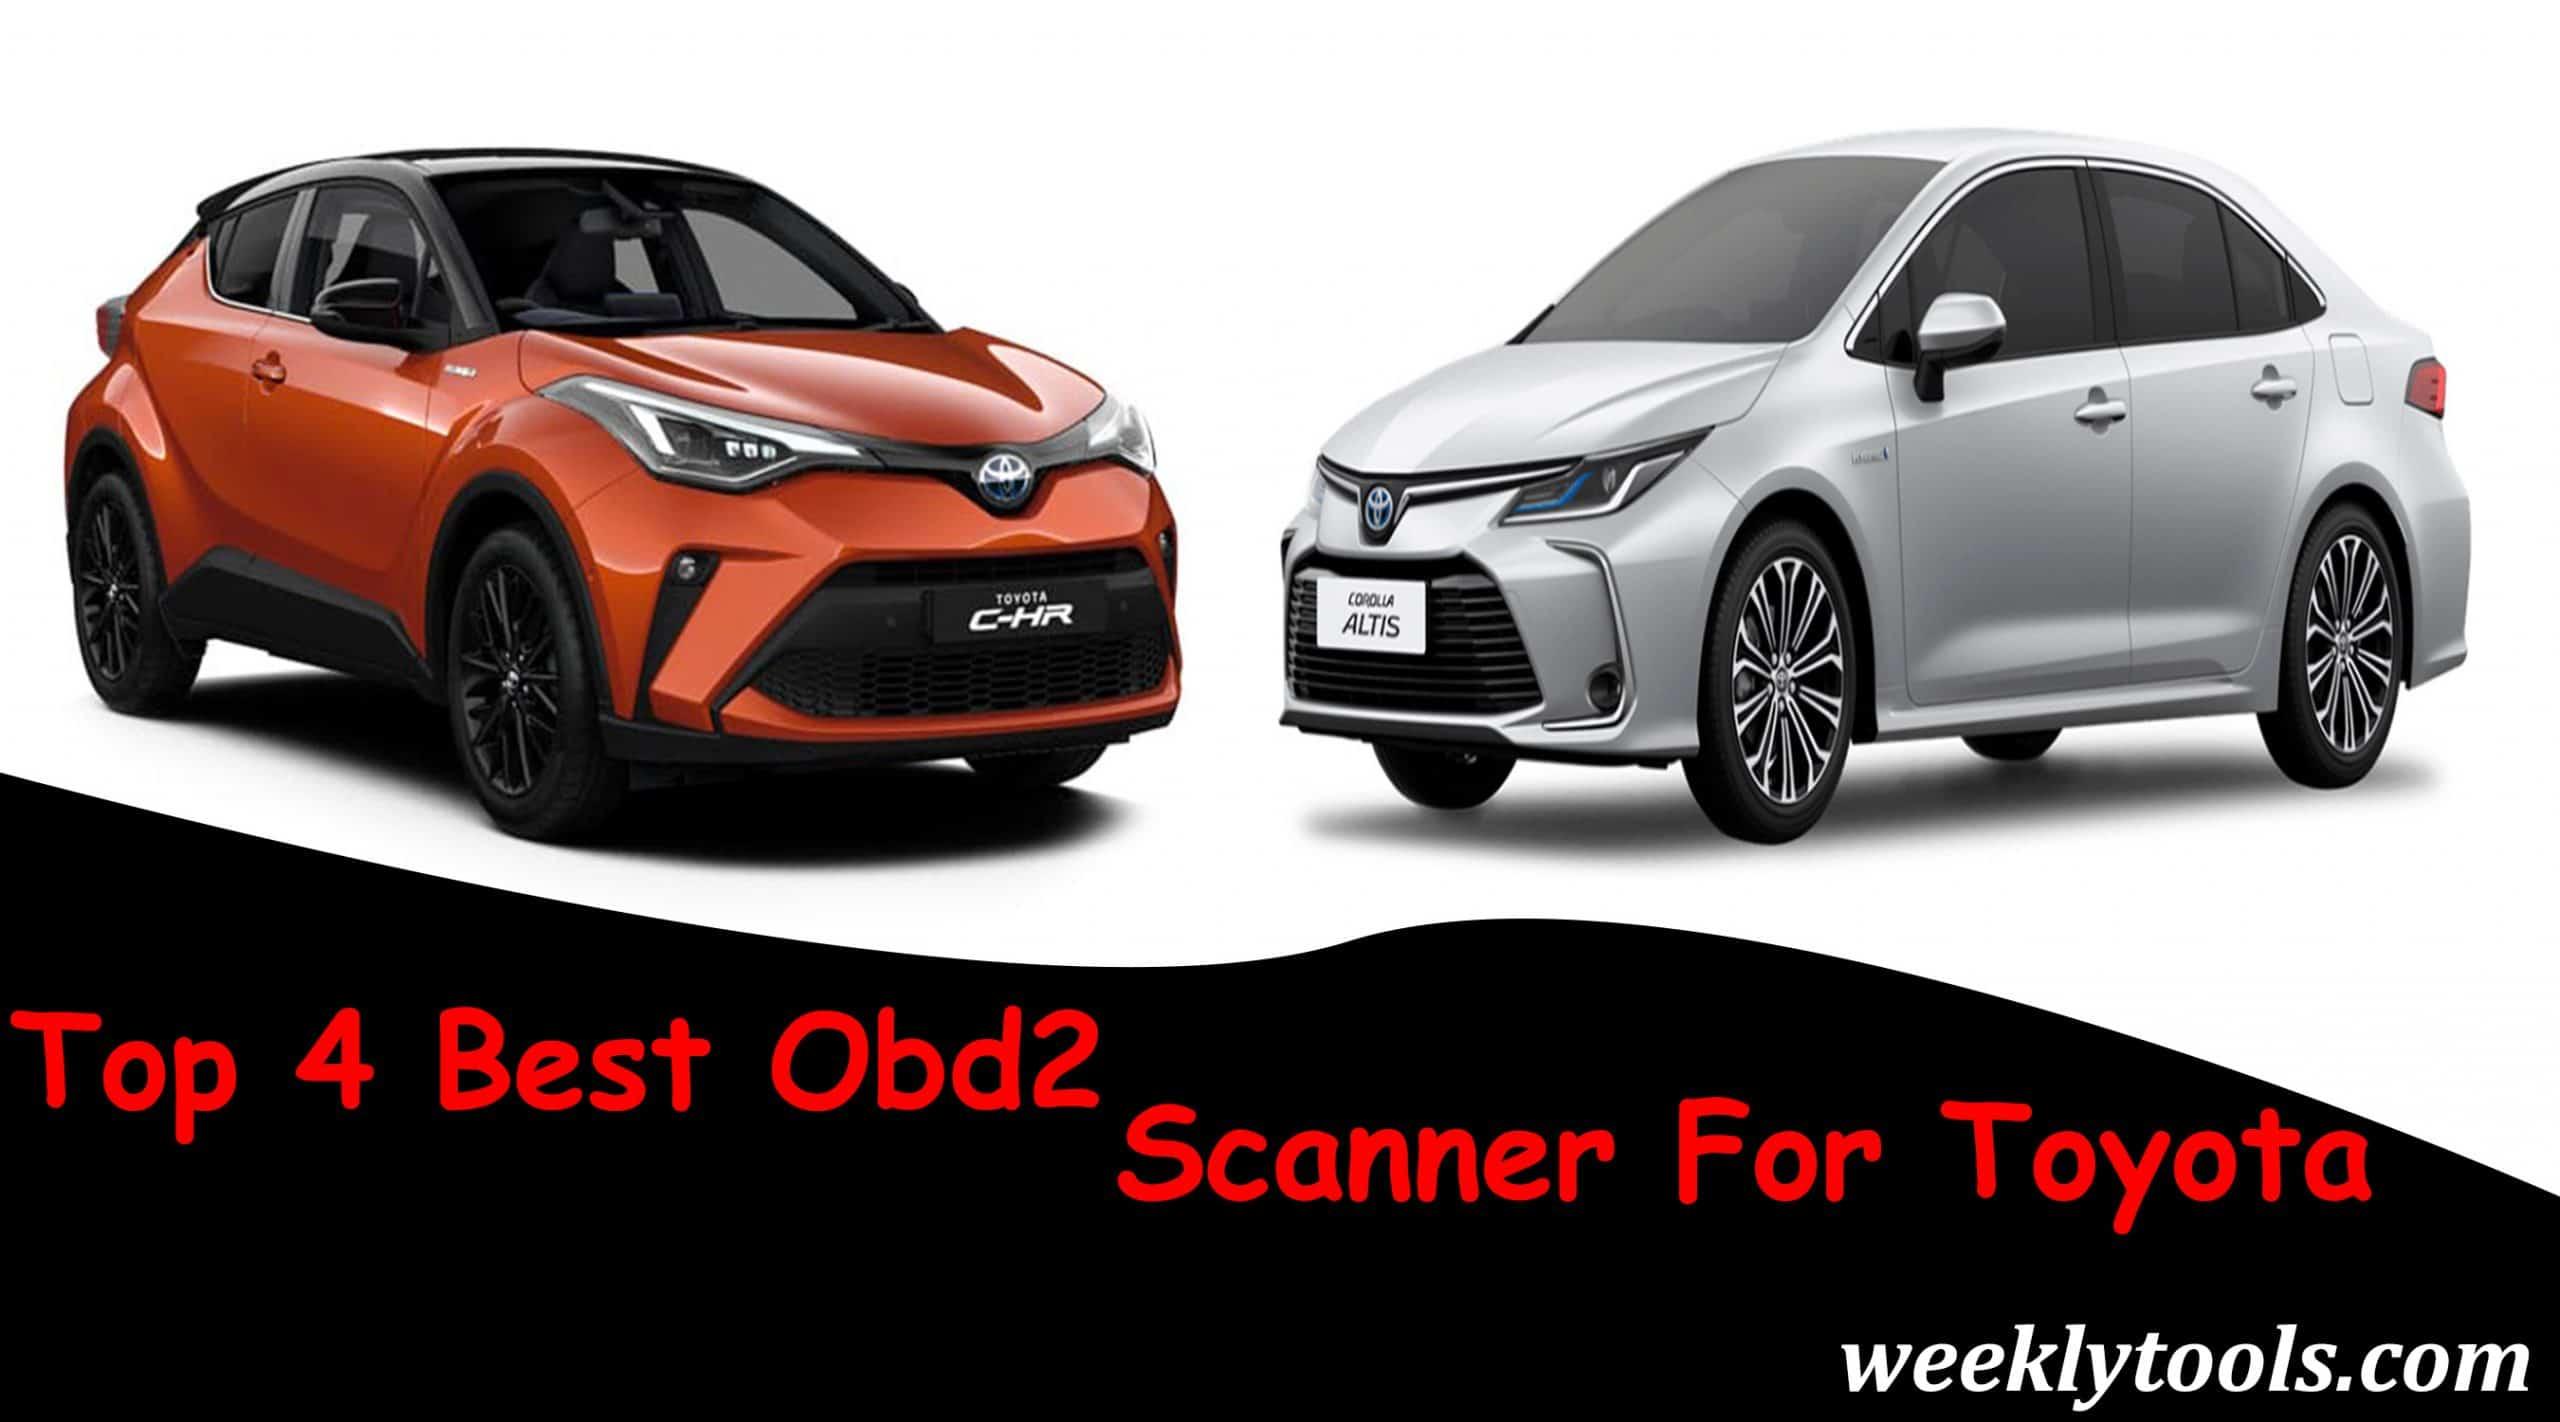 Best Obd2 Scanner For Toyota